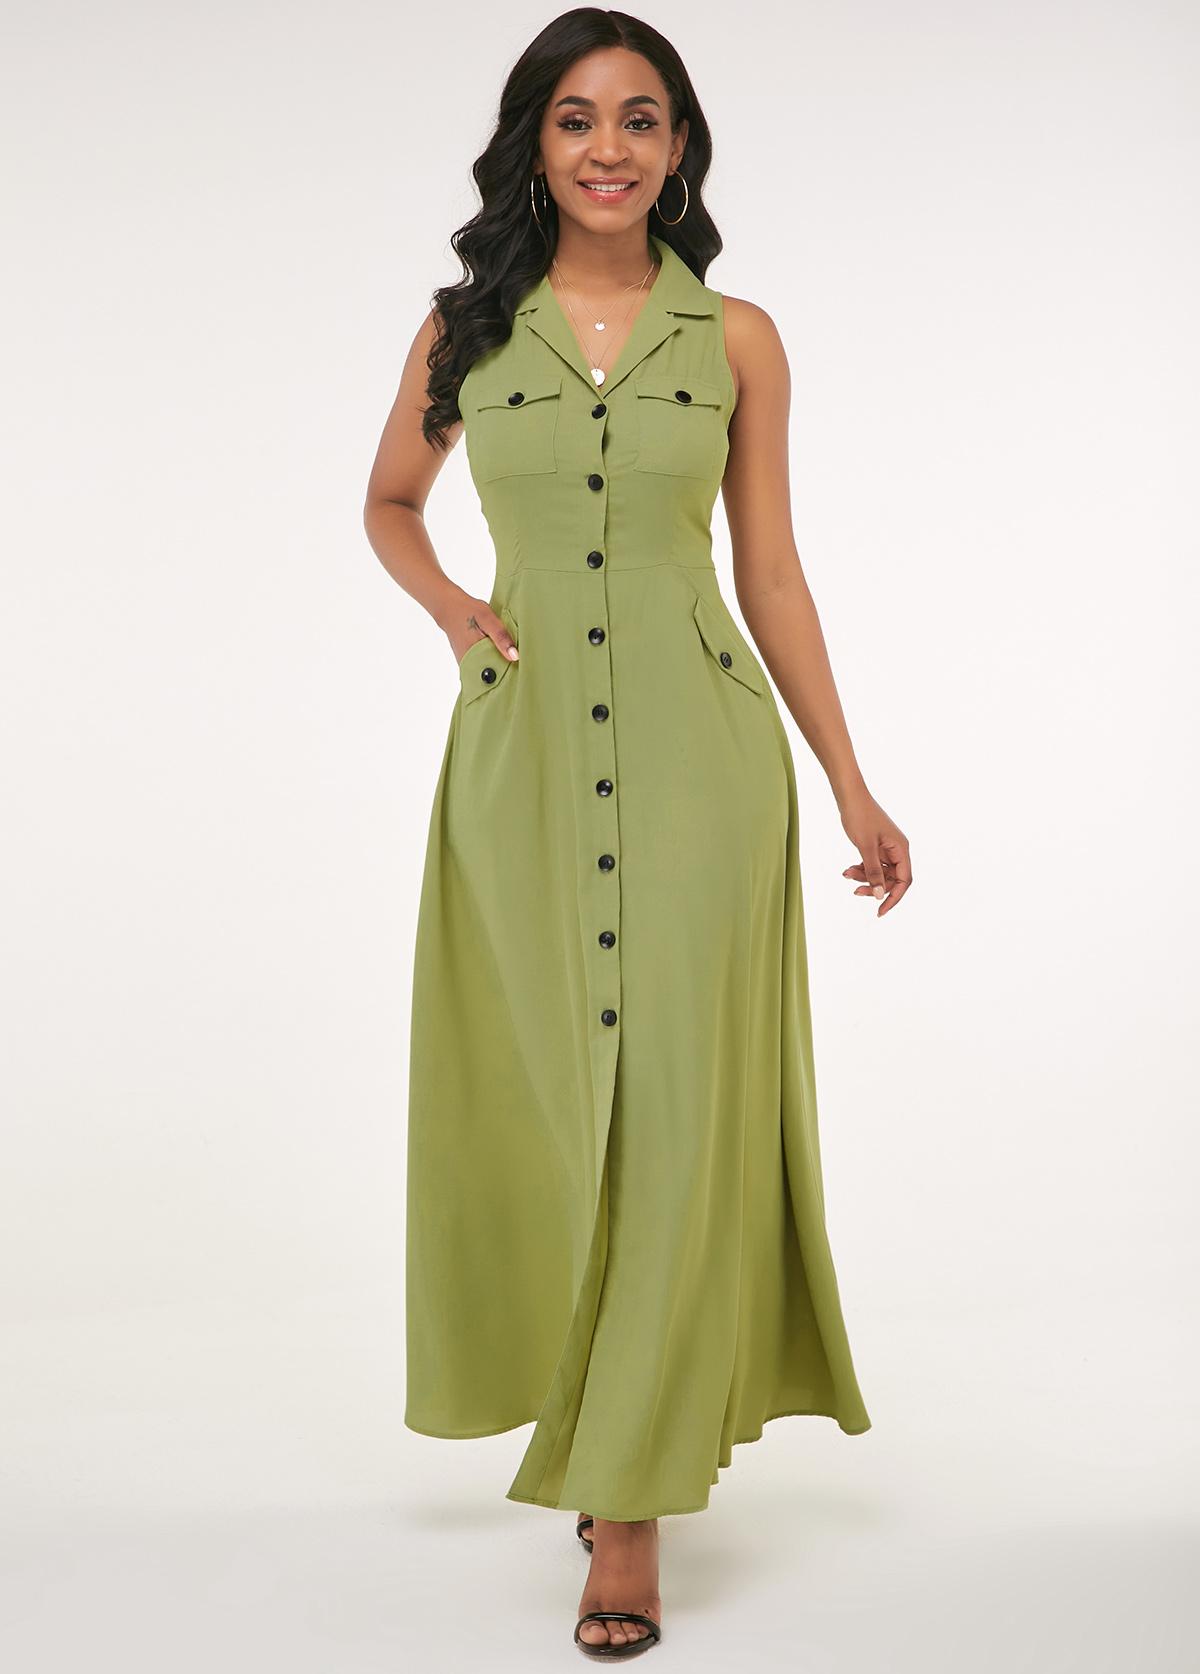 Side Pocket Button Up Turndown Collar Maxi Dress